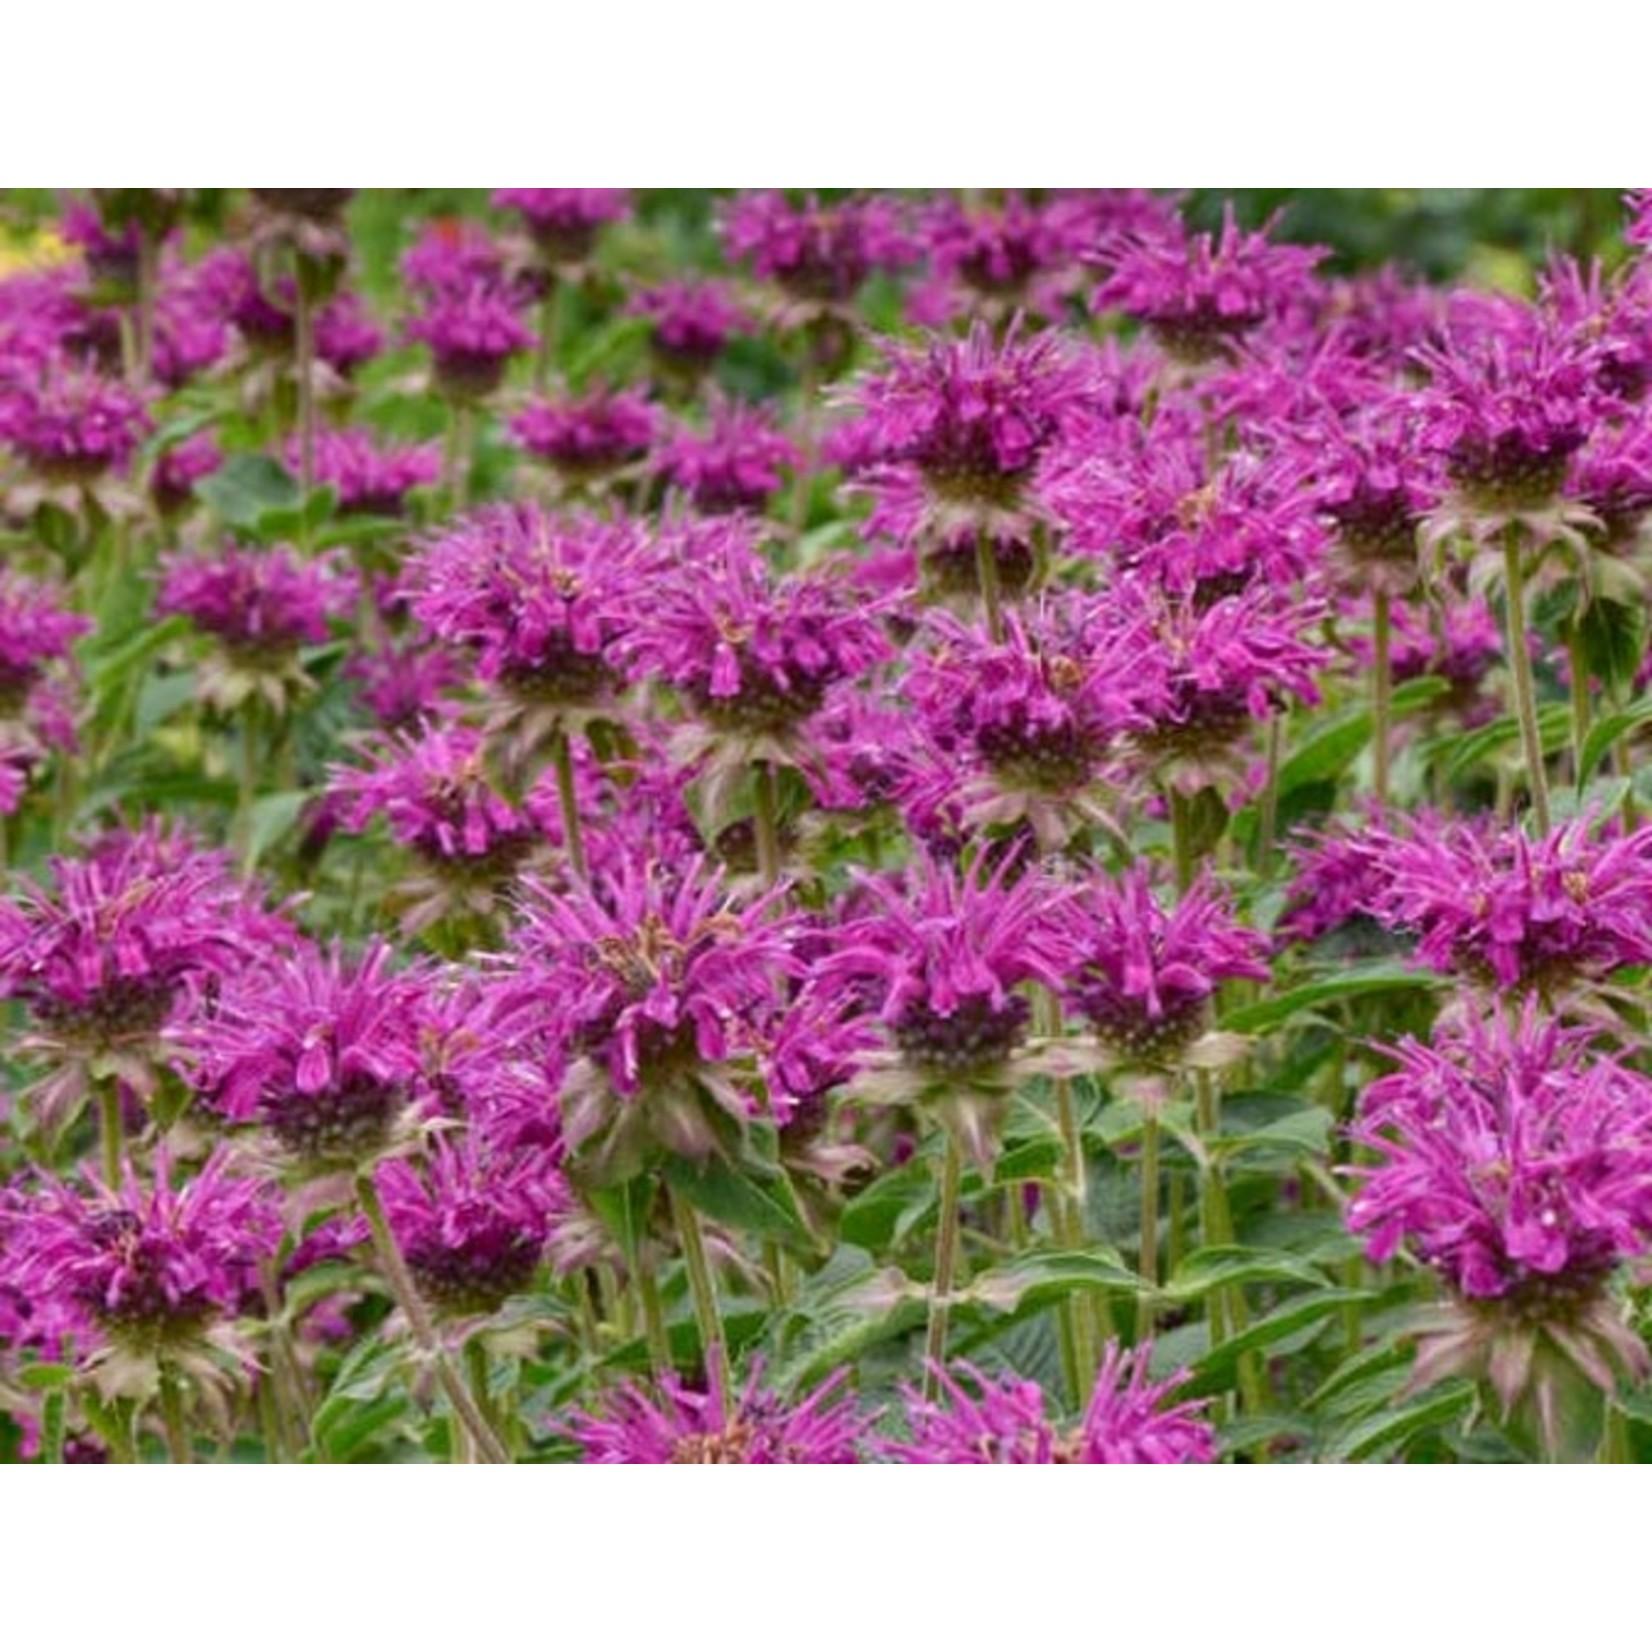 Beebalm 'Monarda Purple Rooster' - 1 gal